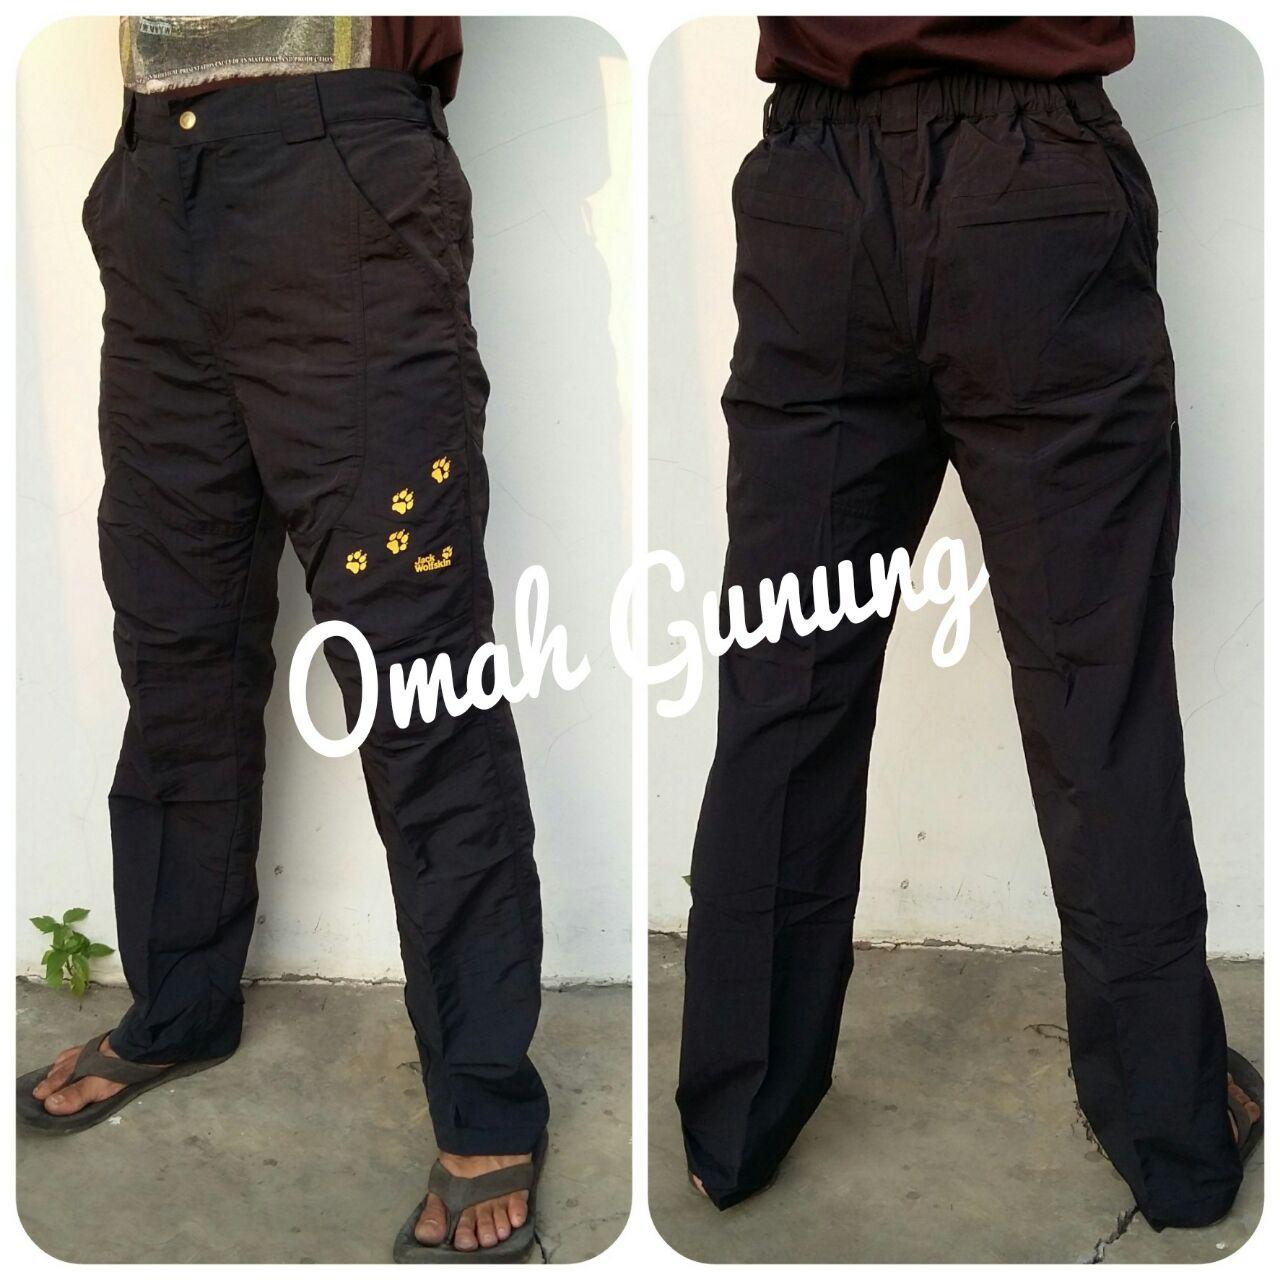 Harga Jual Celana Panjang Quick Dry Pendek Black Yak Original Pant Quickdry Ori Outdoor Gunung Jack Wolfskin